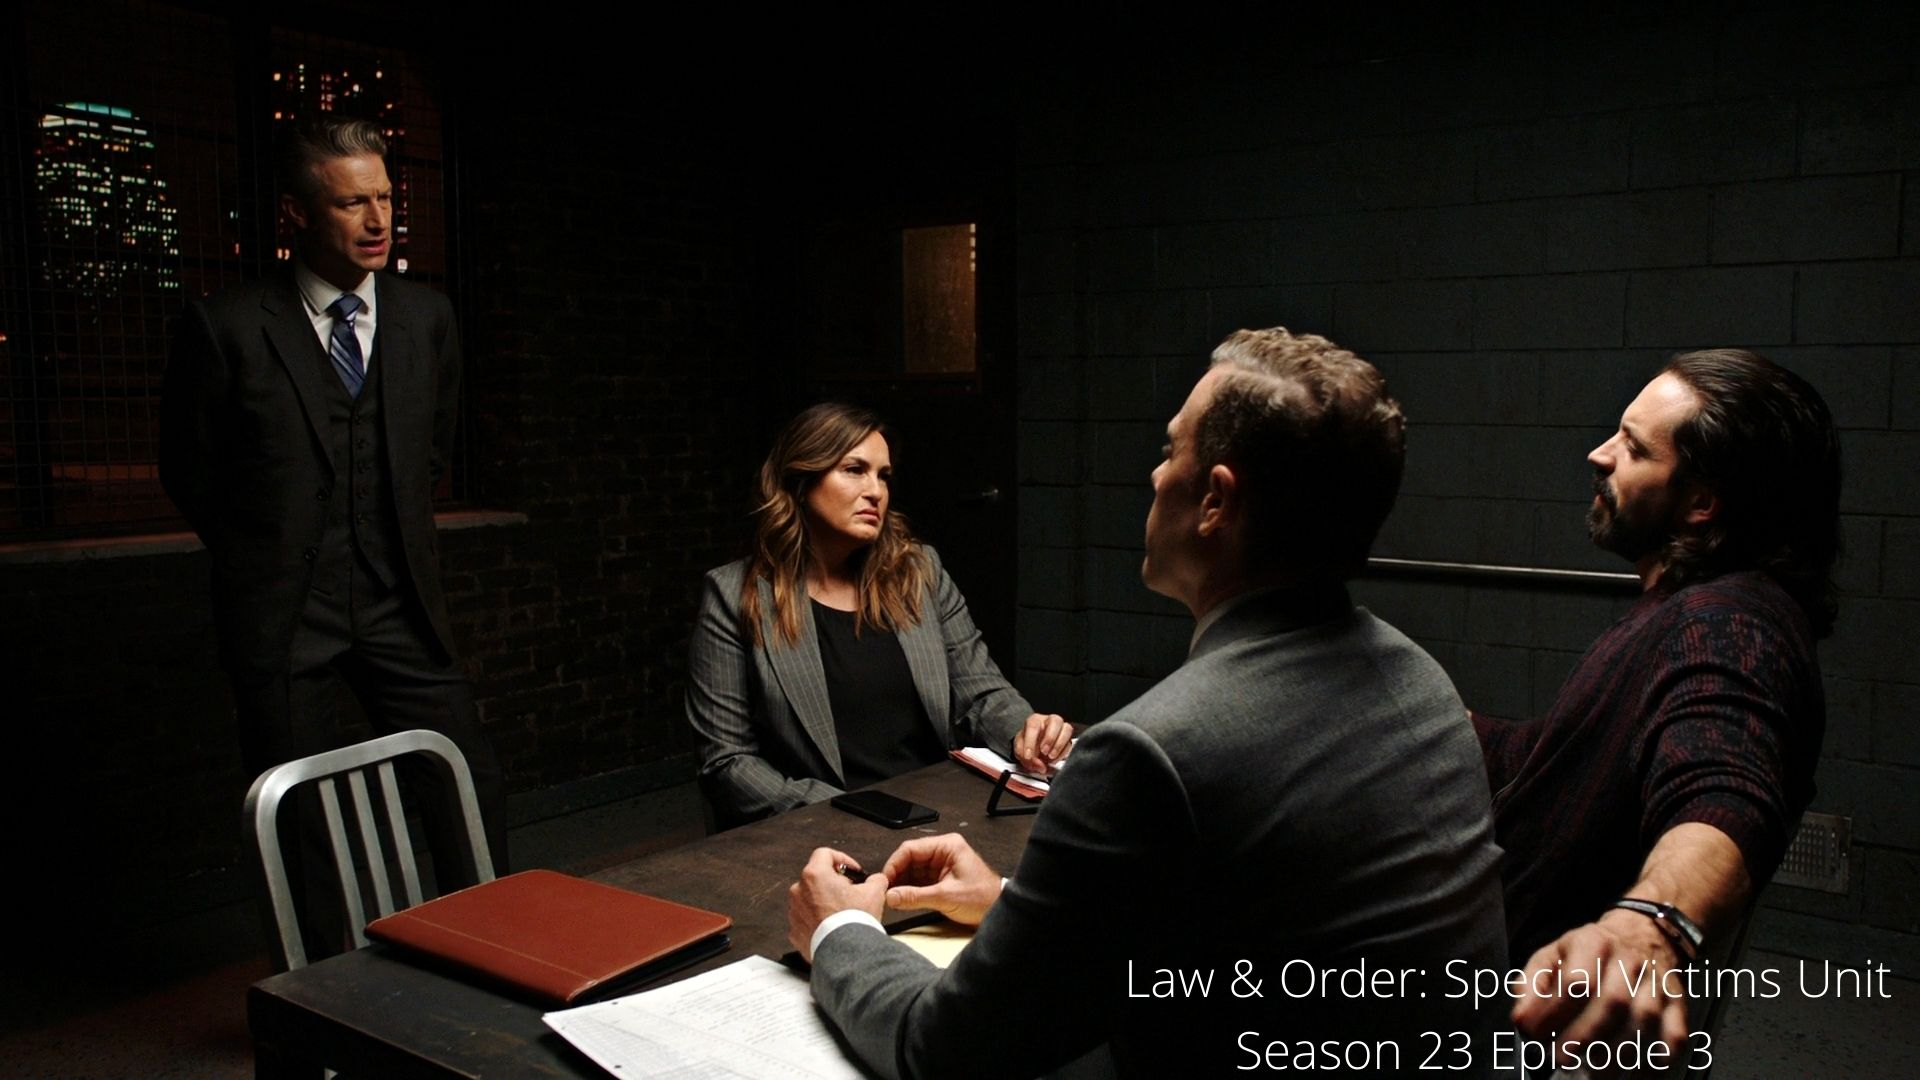 Law & Order: Special Victims Unit Season 23 Episode 4